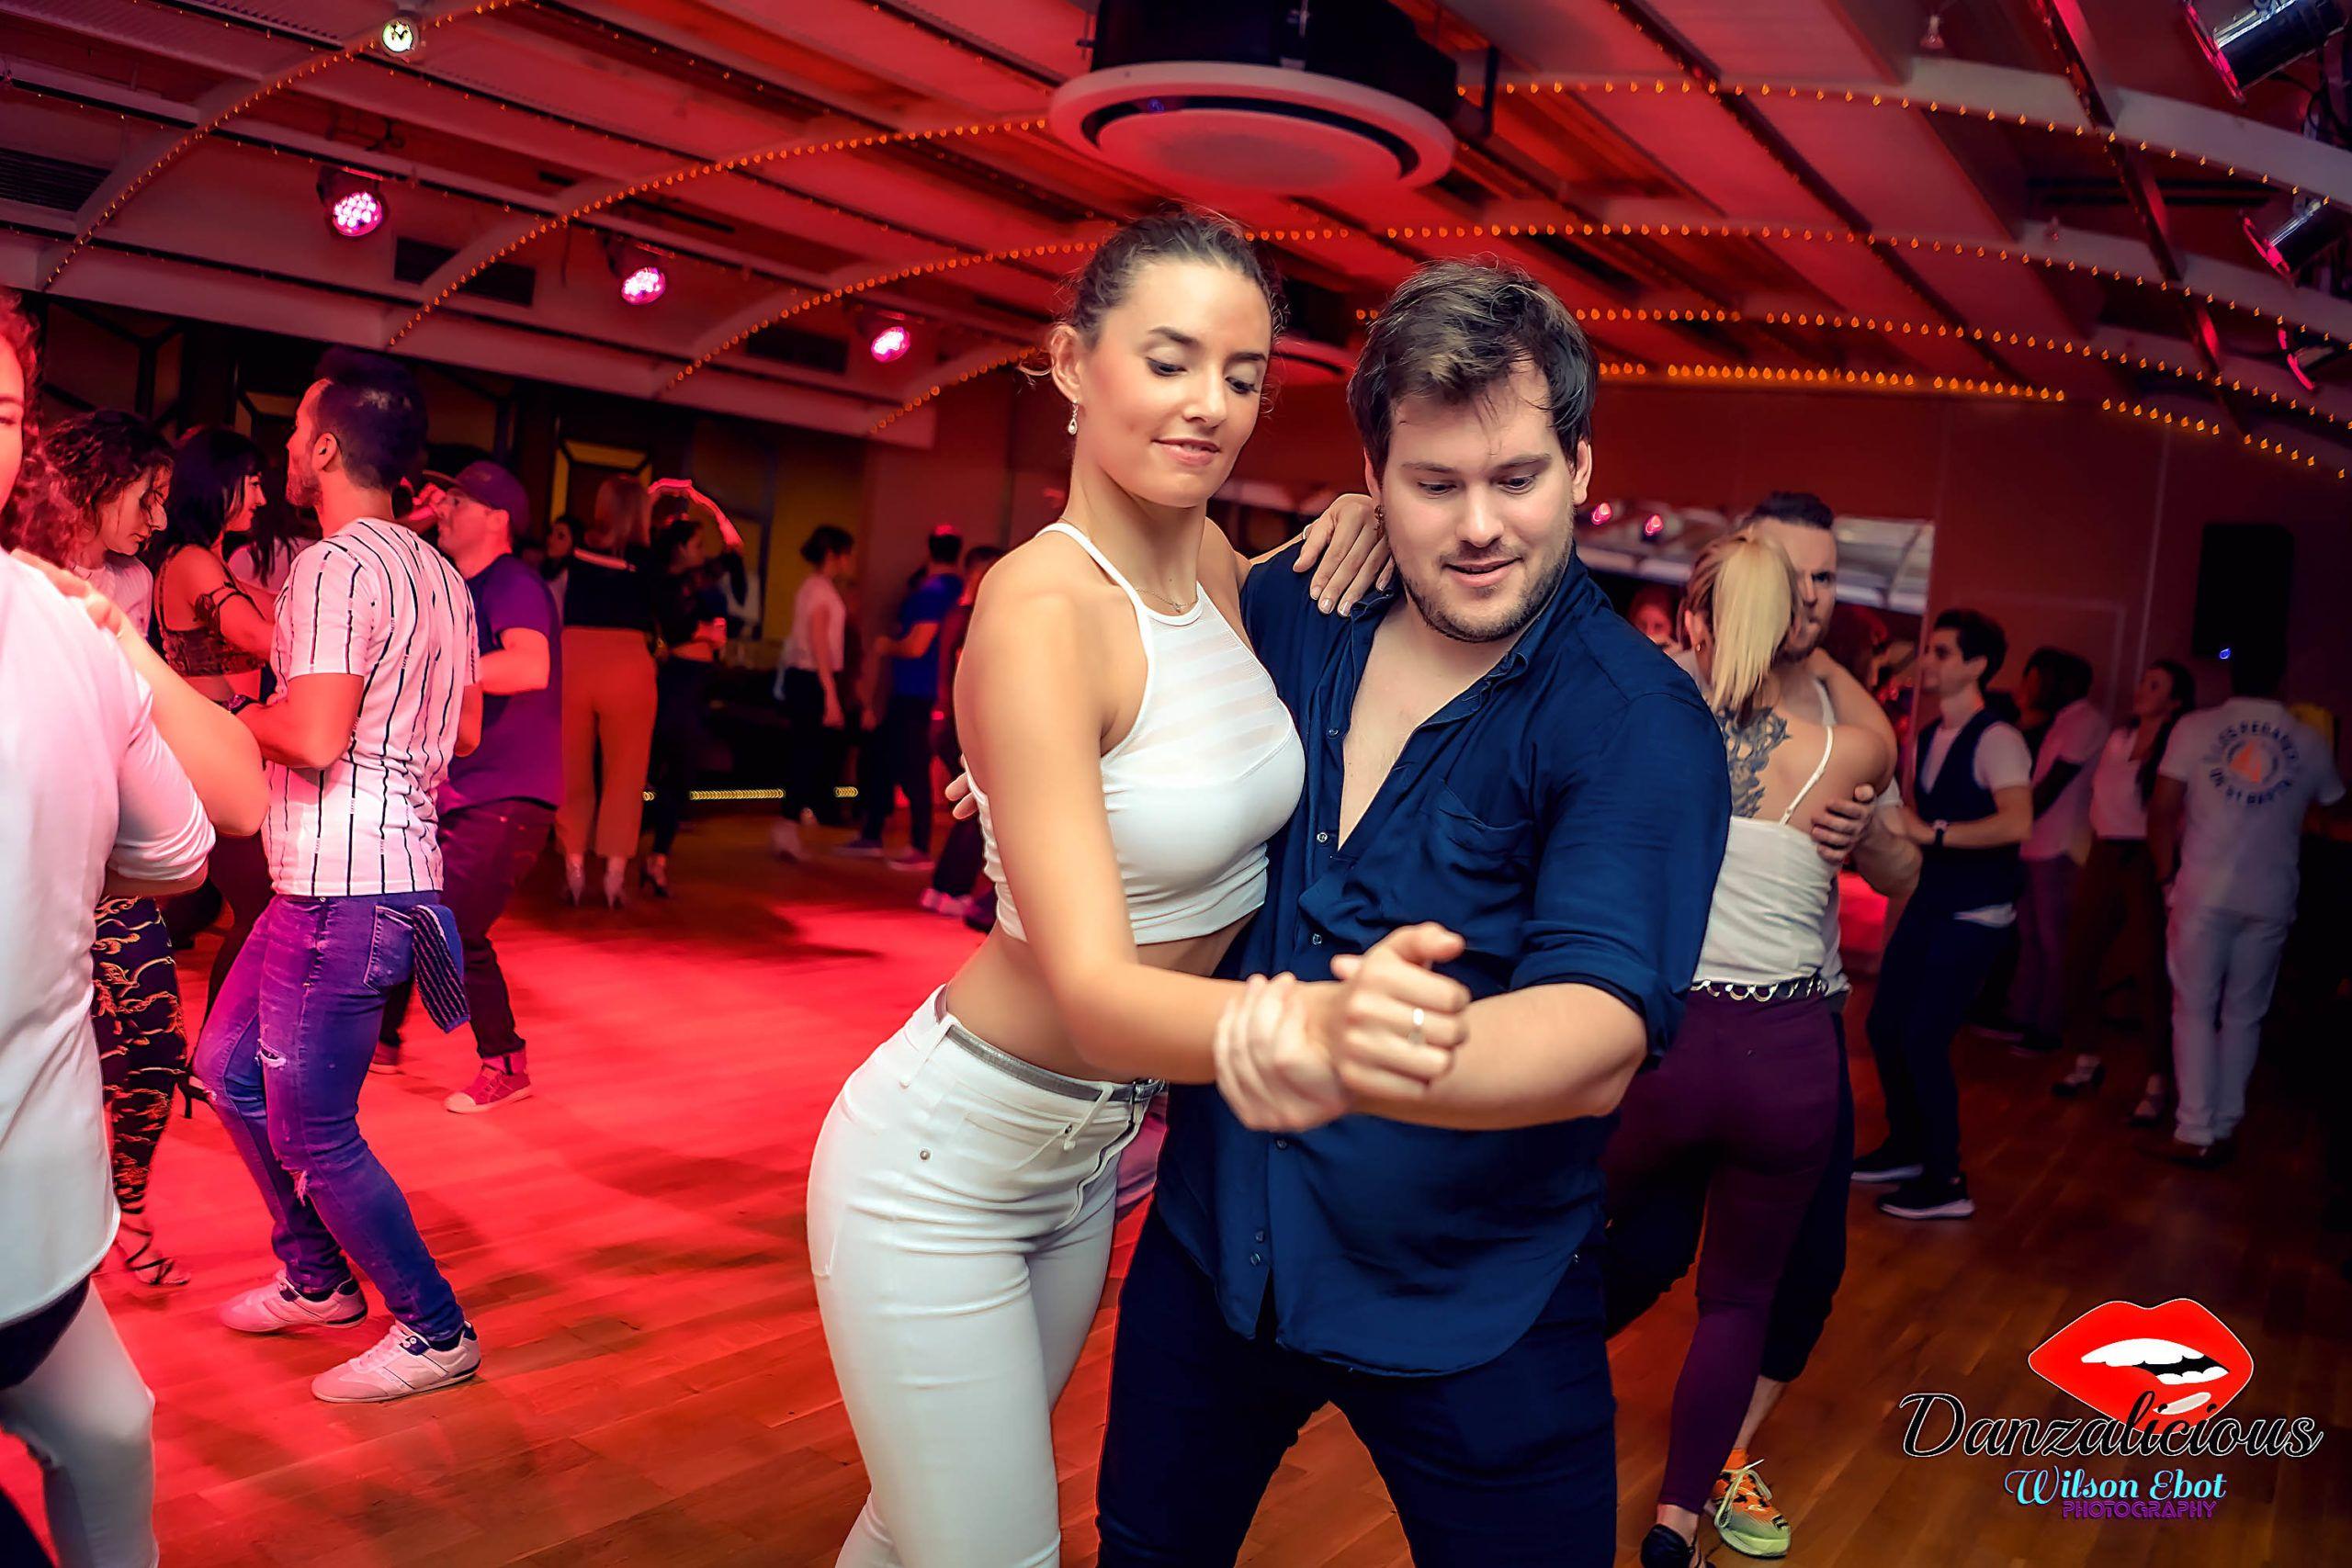 Danzalicious im La Danza Tanzzentrum, Köln